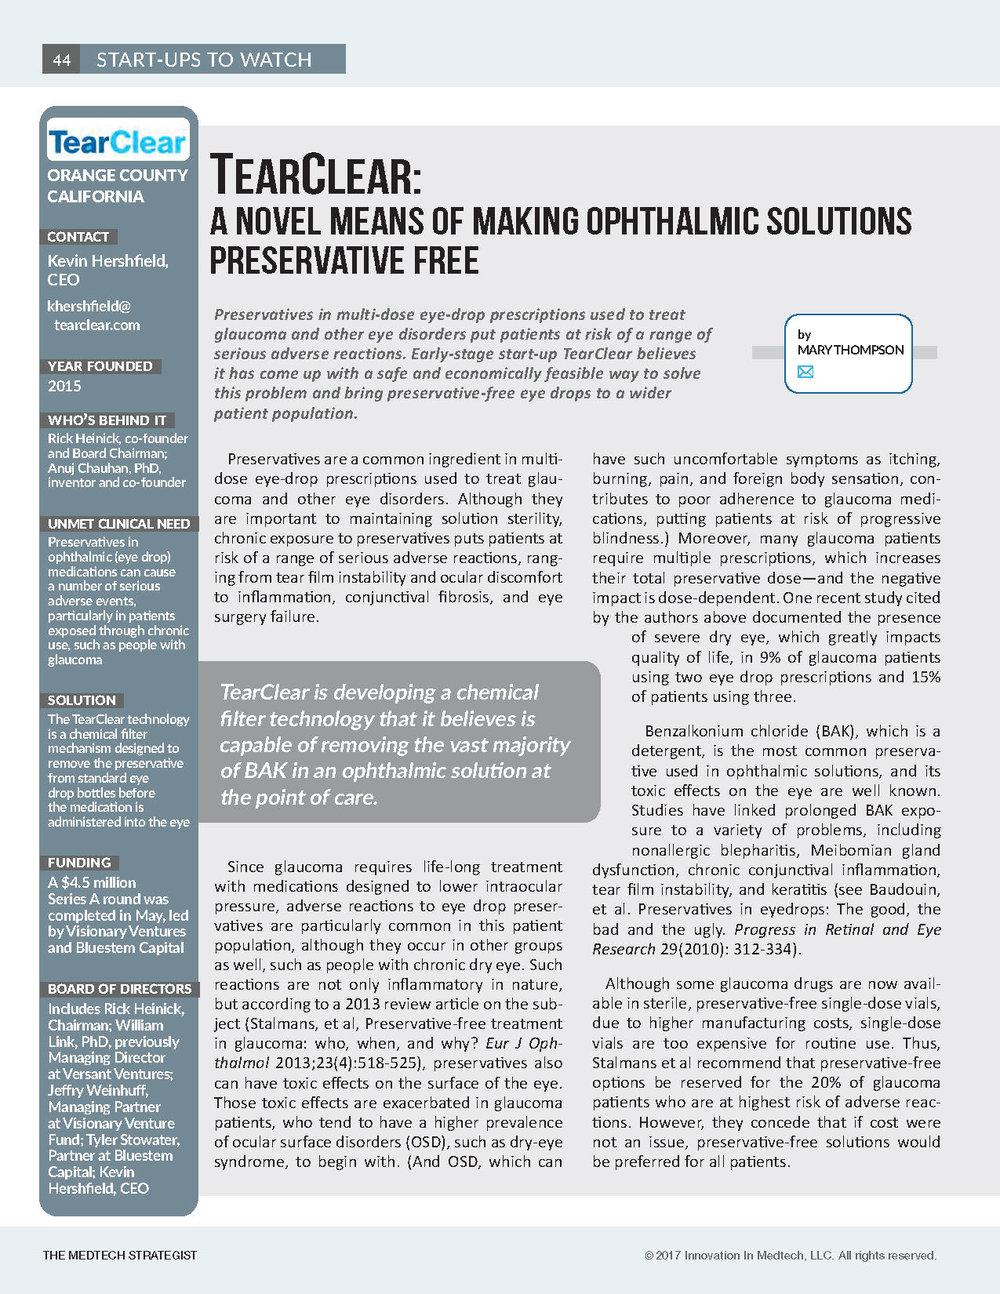 TearClear MTS 7-31-17_Page_2.jpg